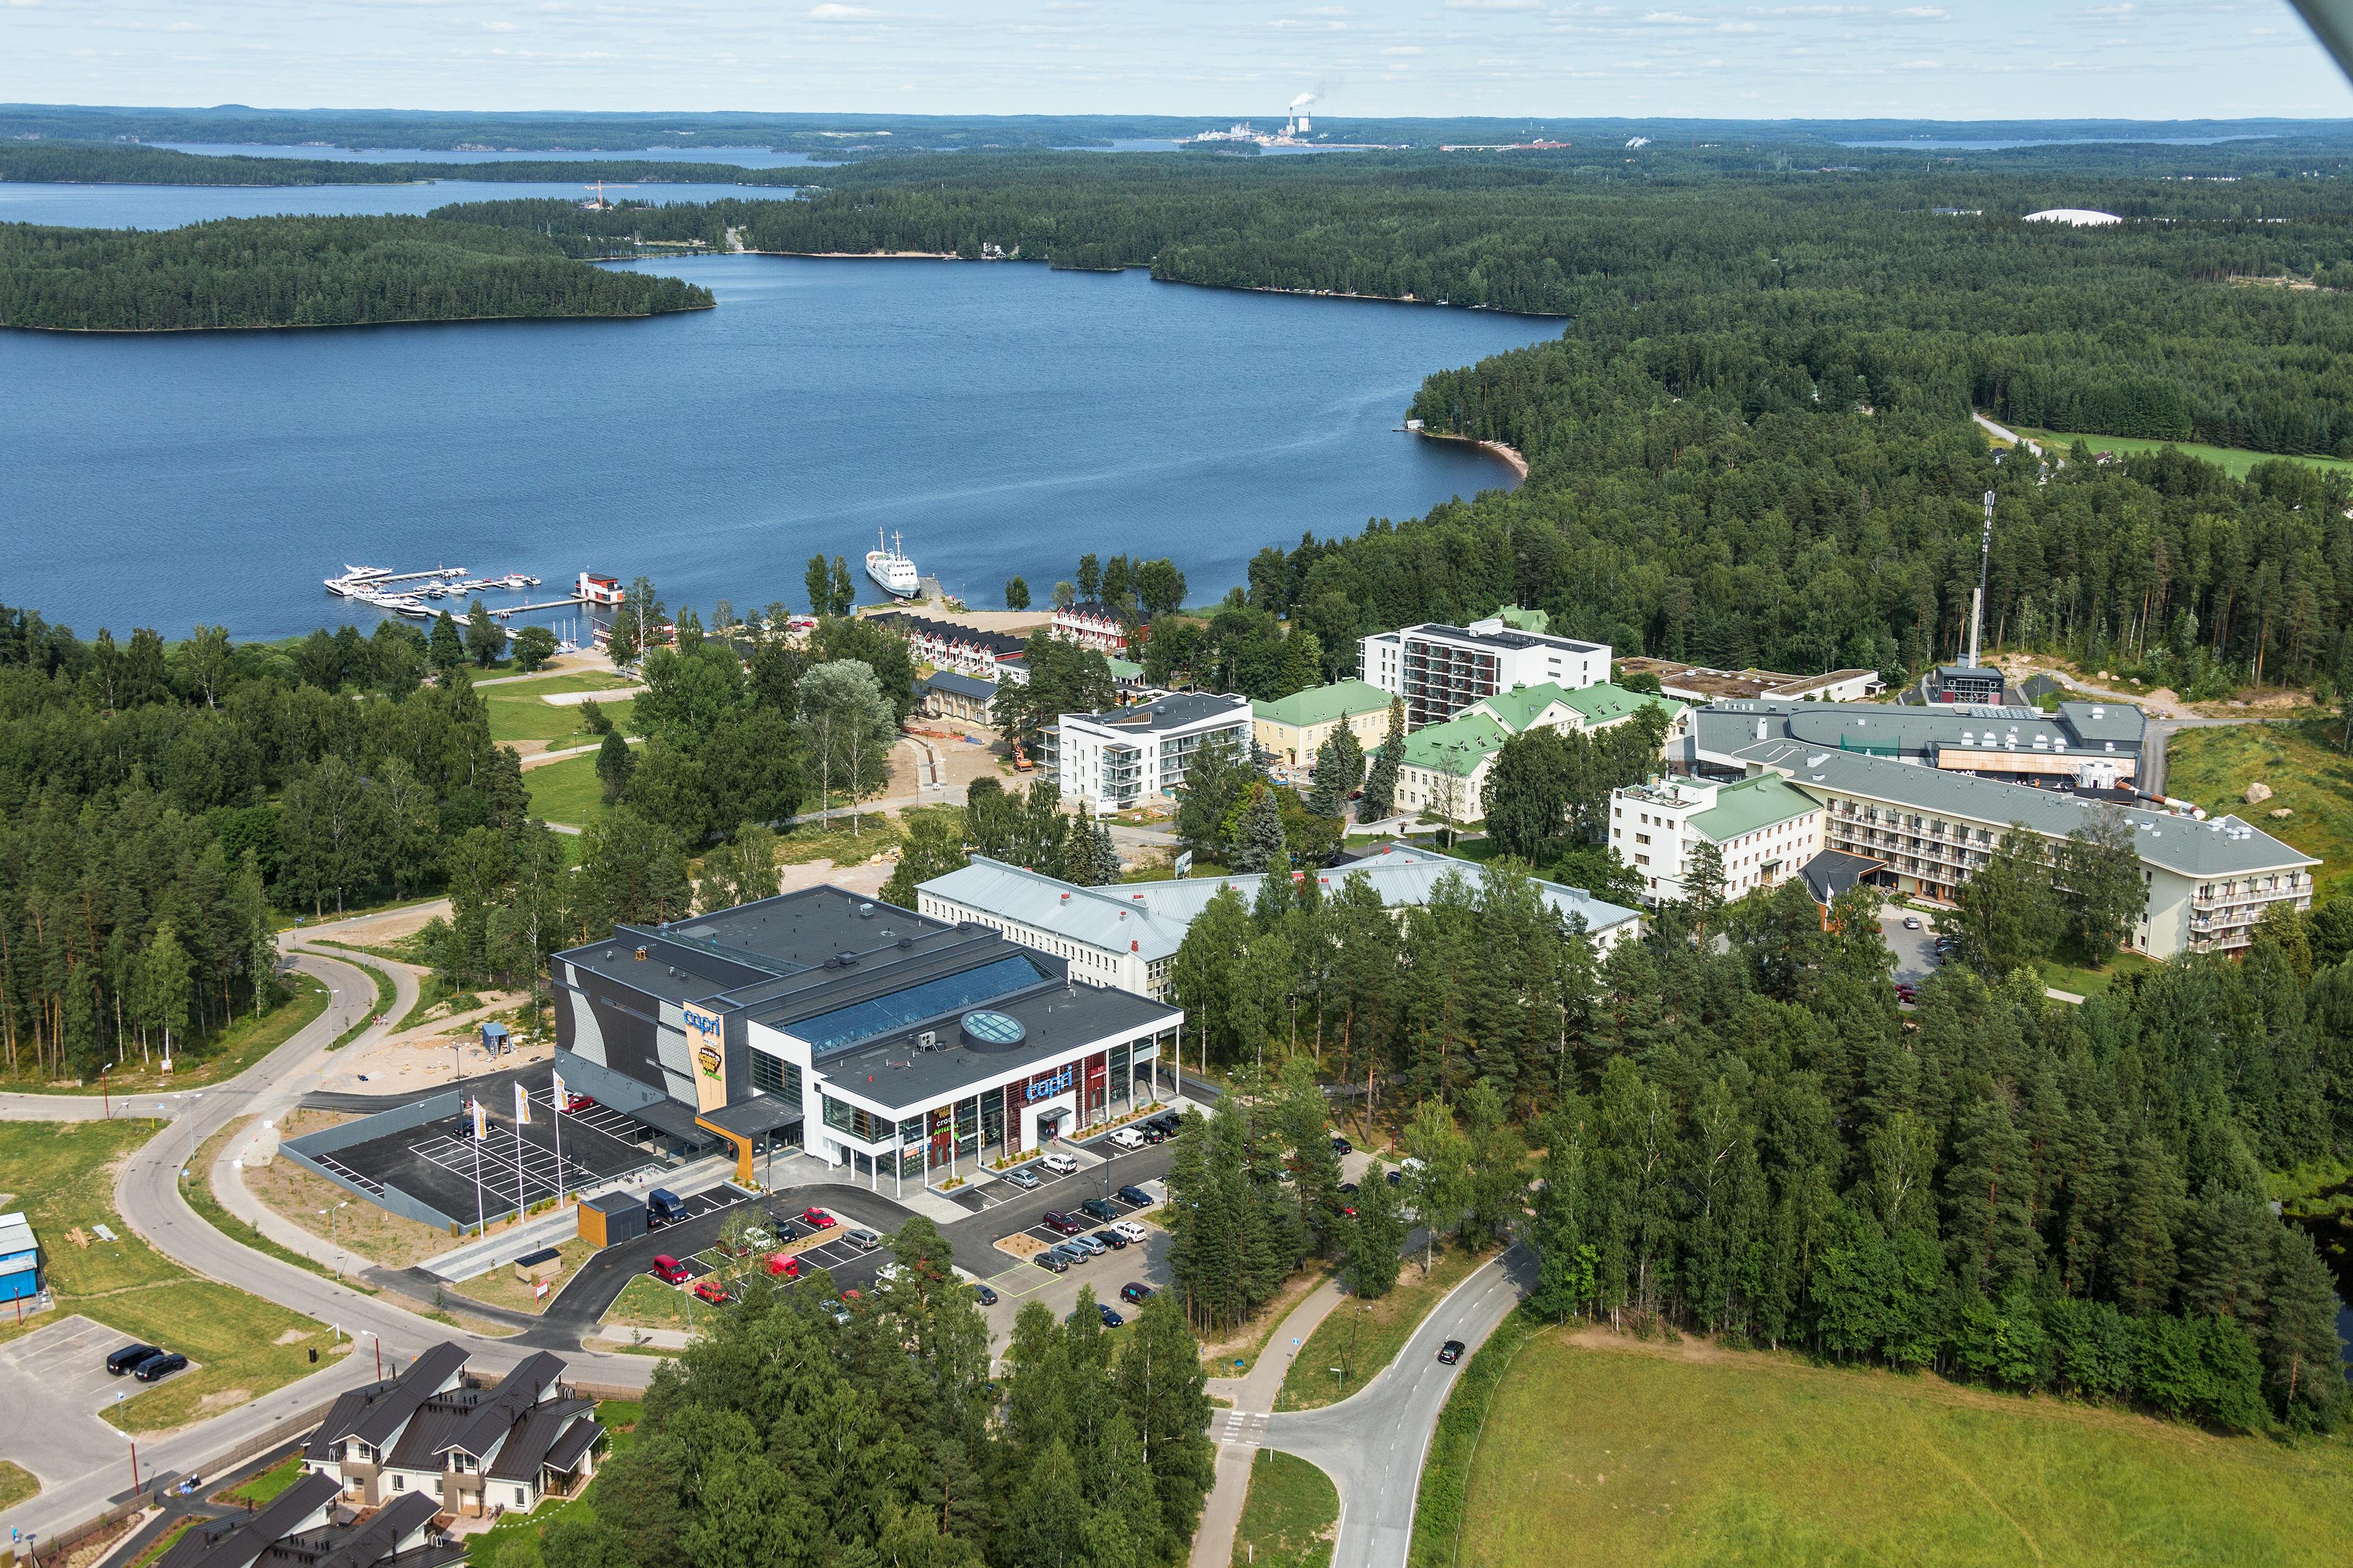 Toimitila, Vipelentie 3-5, Lappeenranta, Lappeenranta